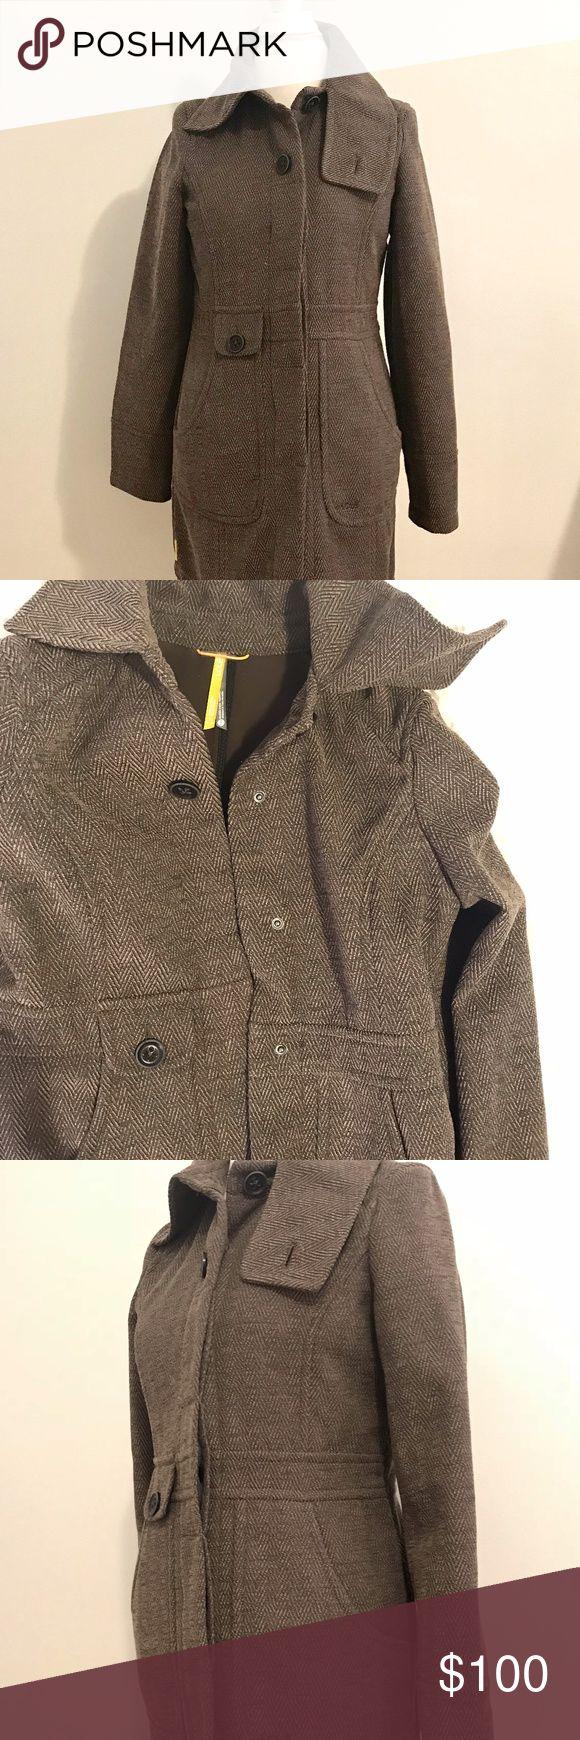 Lolё Peacoat Jacket Lolё Women's Jacket • 100% Polyester • Durable Water Repellent Jacket  Barely Worn. Beautiful Coat. Size Small (4-6) Lole Jackets & Coats Pea Coats